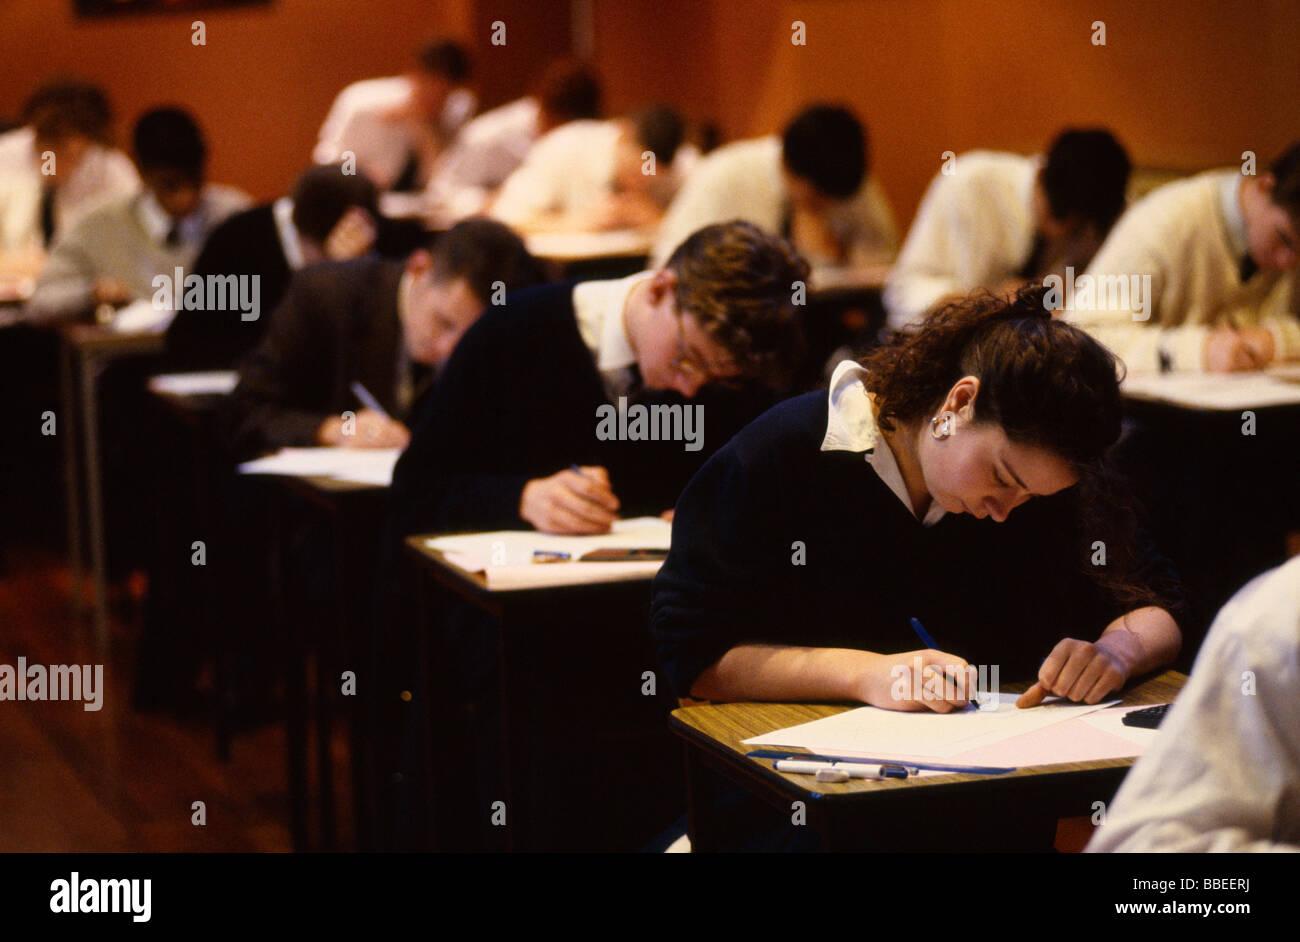 england-education-secondary-school-exams